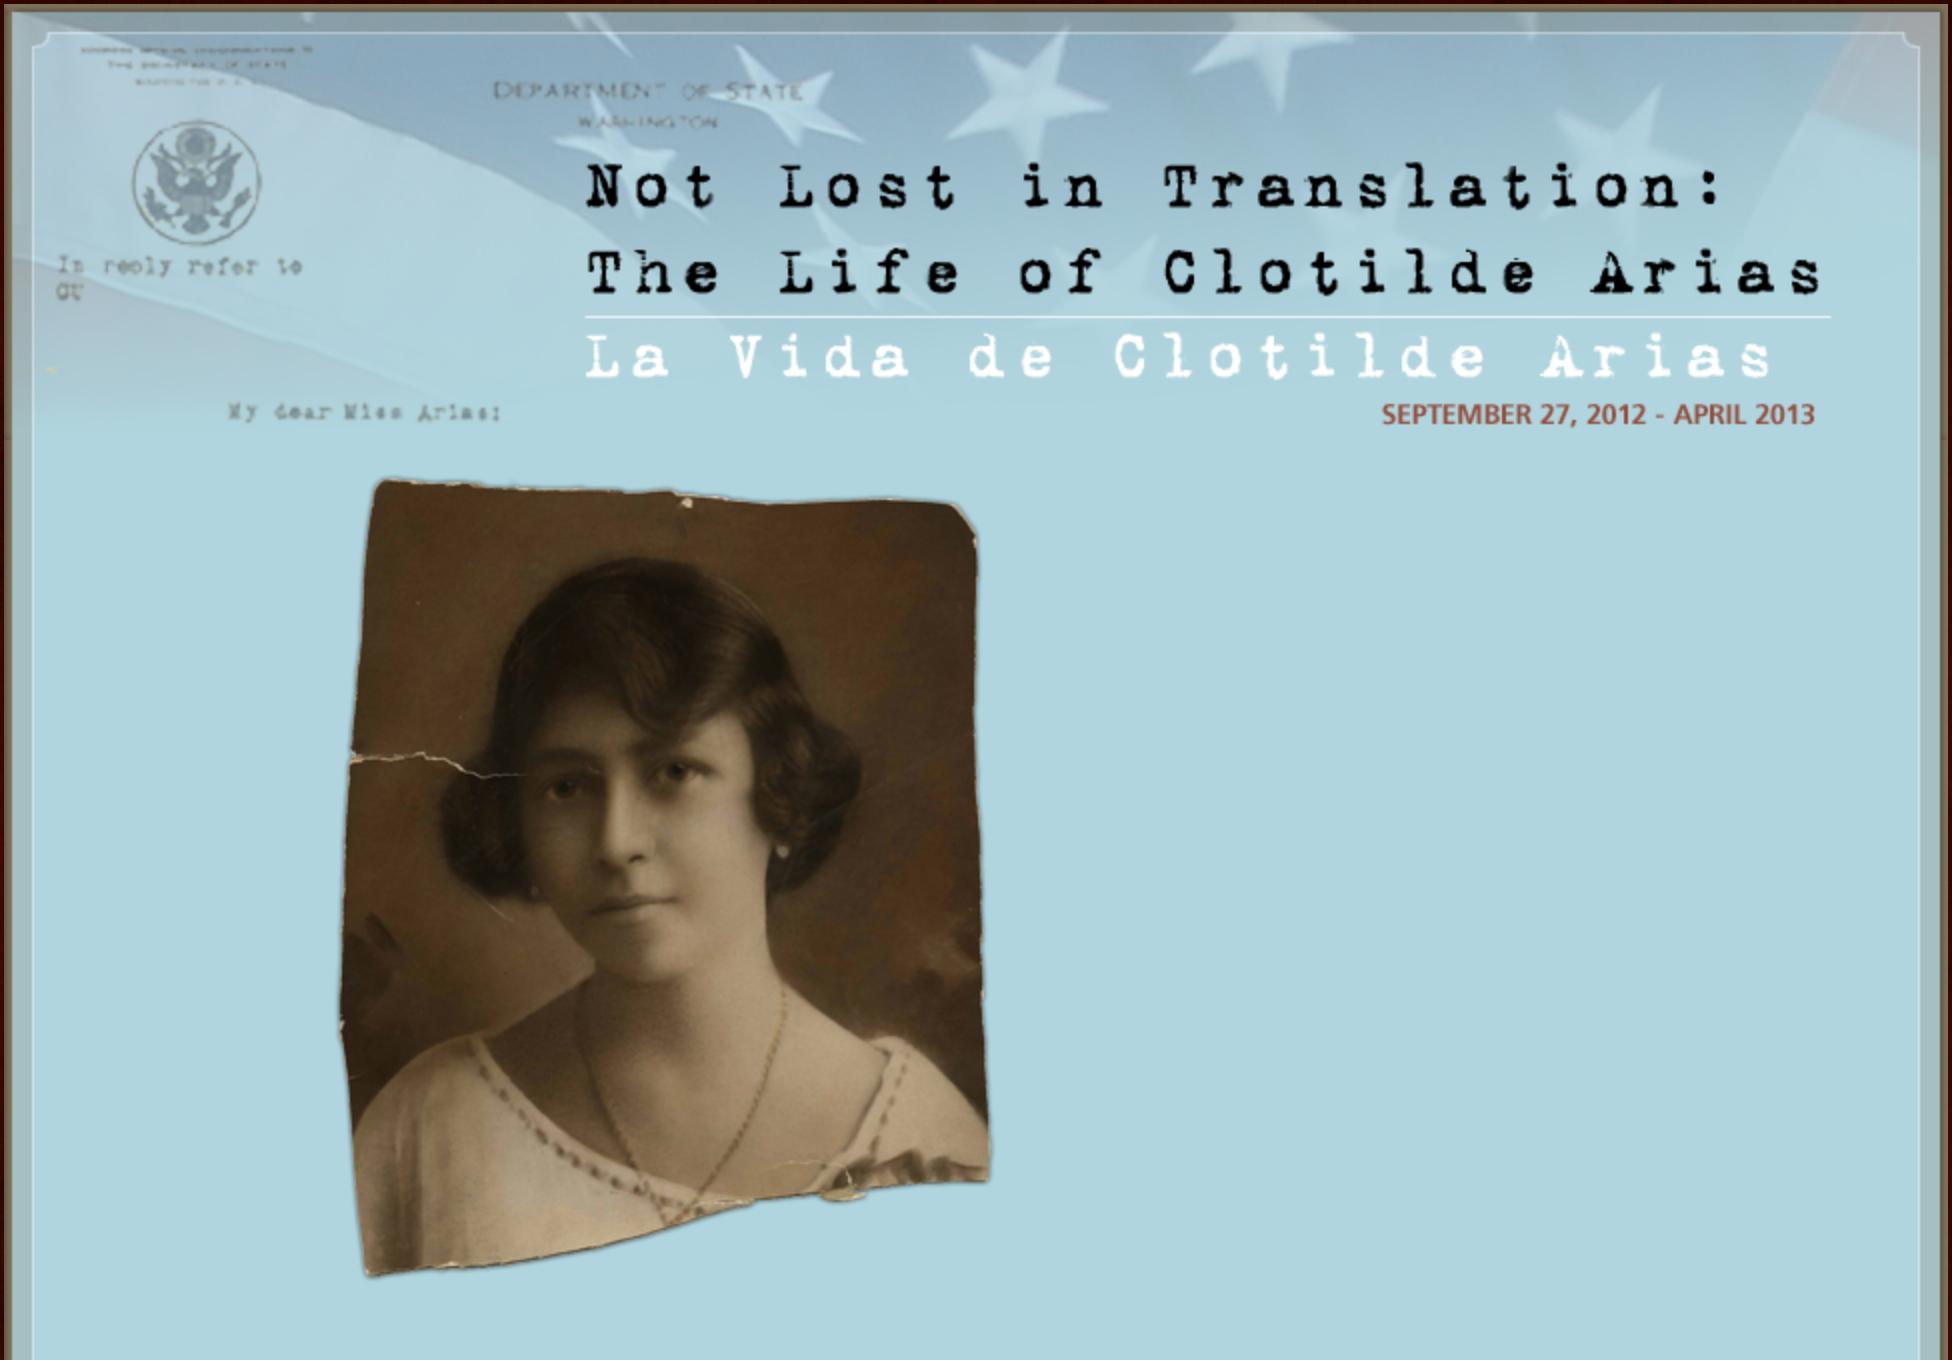 image of website